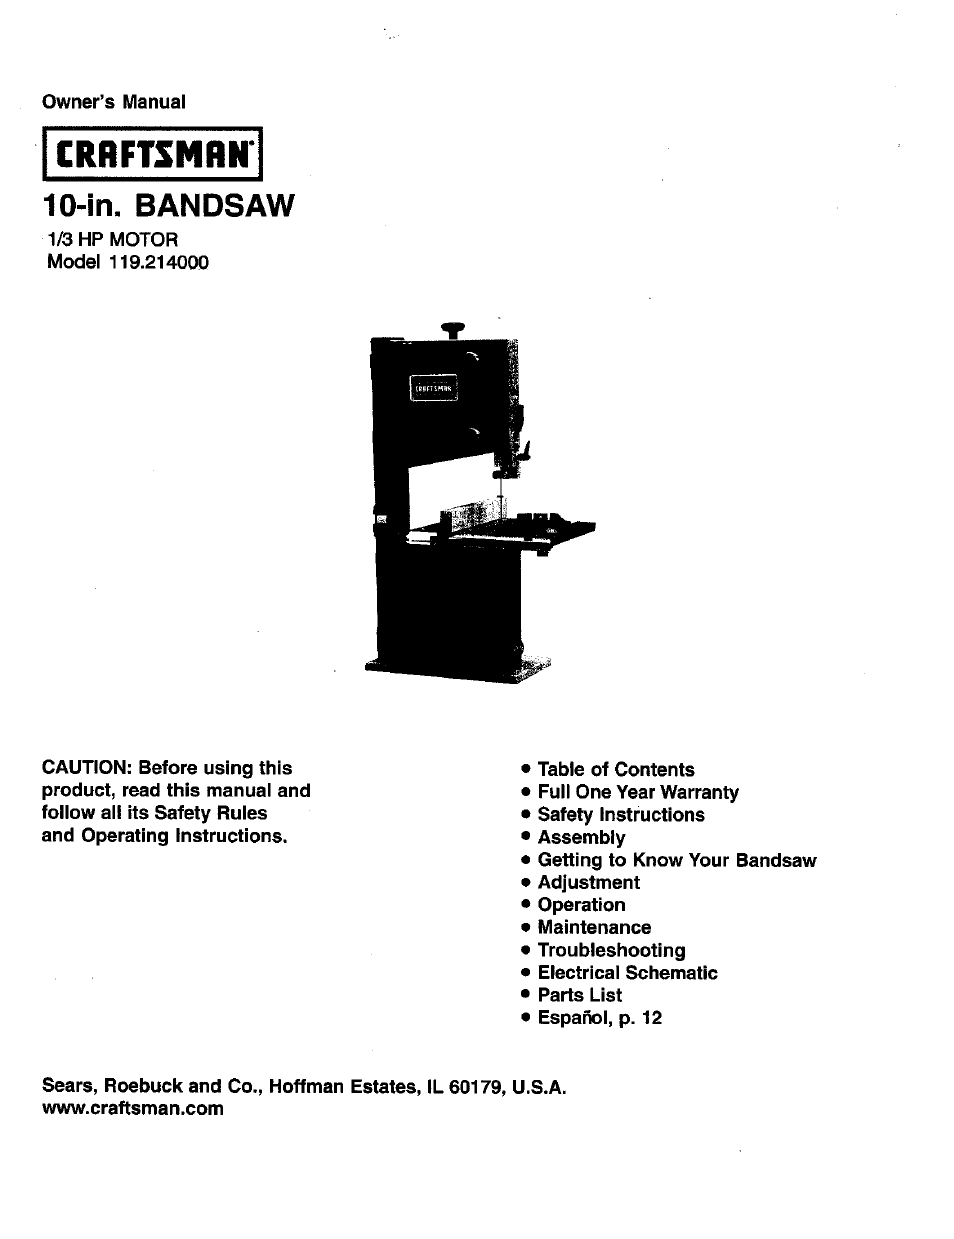 Craftsman 119.214000 User Manual | 20 pages on transformer schematics, electronics schematics, piping schematics, tube amp schematics, ford diagrams schematics, design schematics, plumbing schematics, engineering schematics, engine schematics, amplifier schematics, electrical schematics, ecu schematics, ignition schematics, generator schematics, transmission schematics, computer schematics, ductwork schematics, circuit schematics, motor schematics, wire schematics,